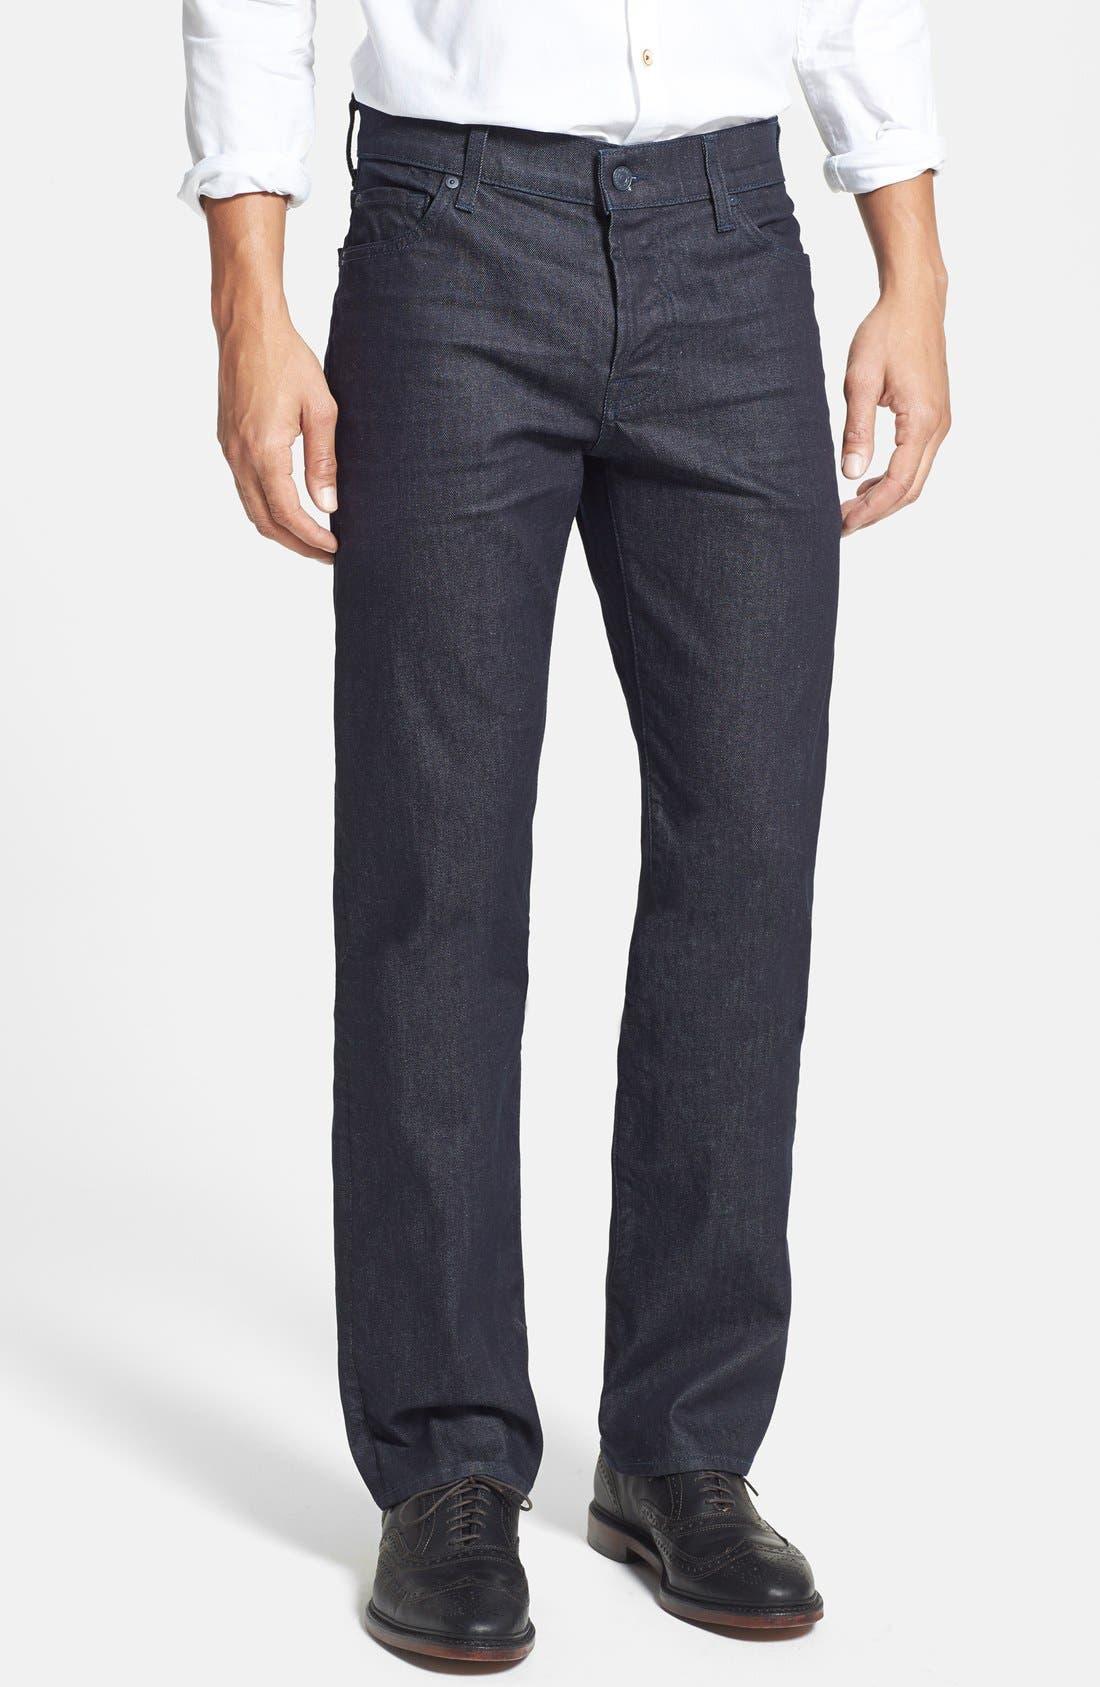 Alternate Image 1 Selected - 7 For All Mankind® 'Standard' Straight Leg Jeans (Deep Indigo)